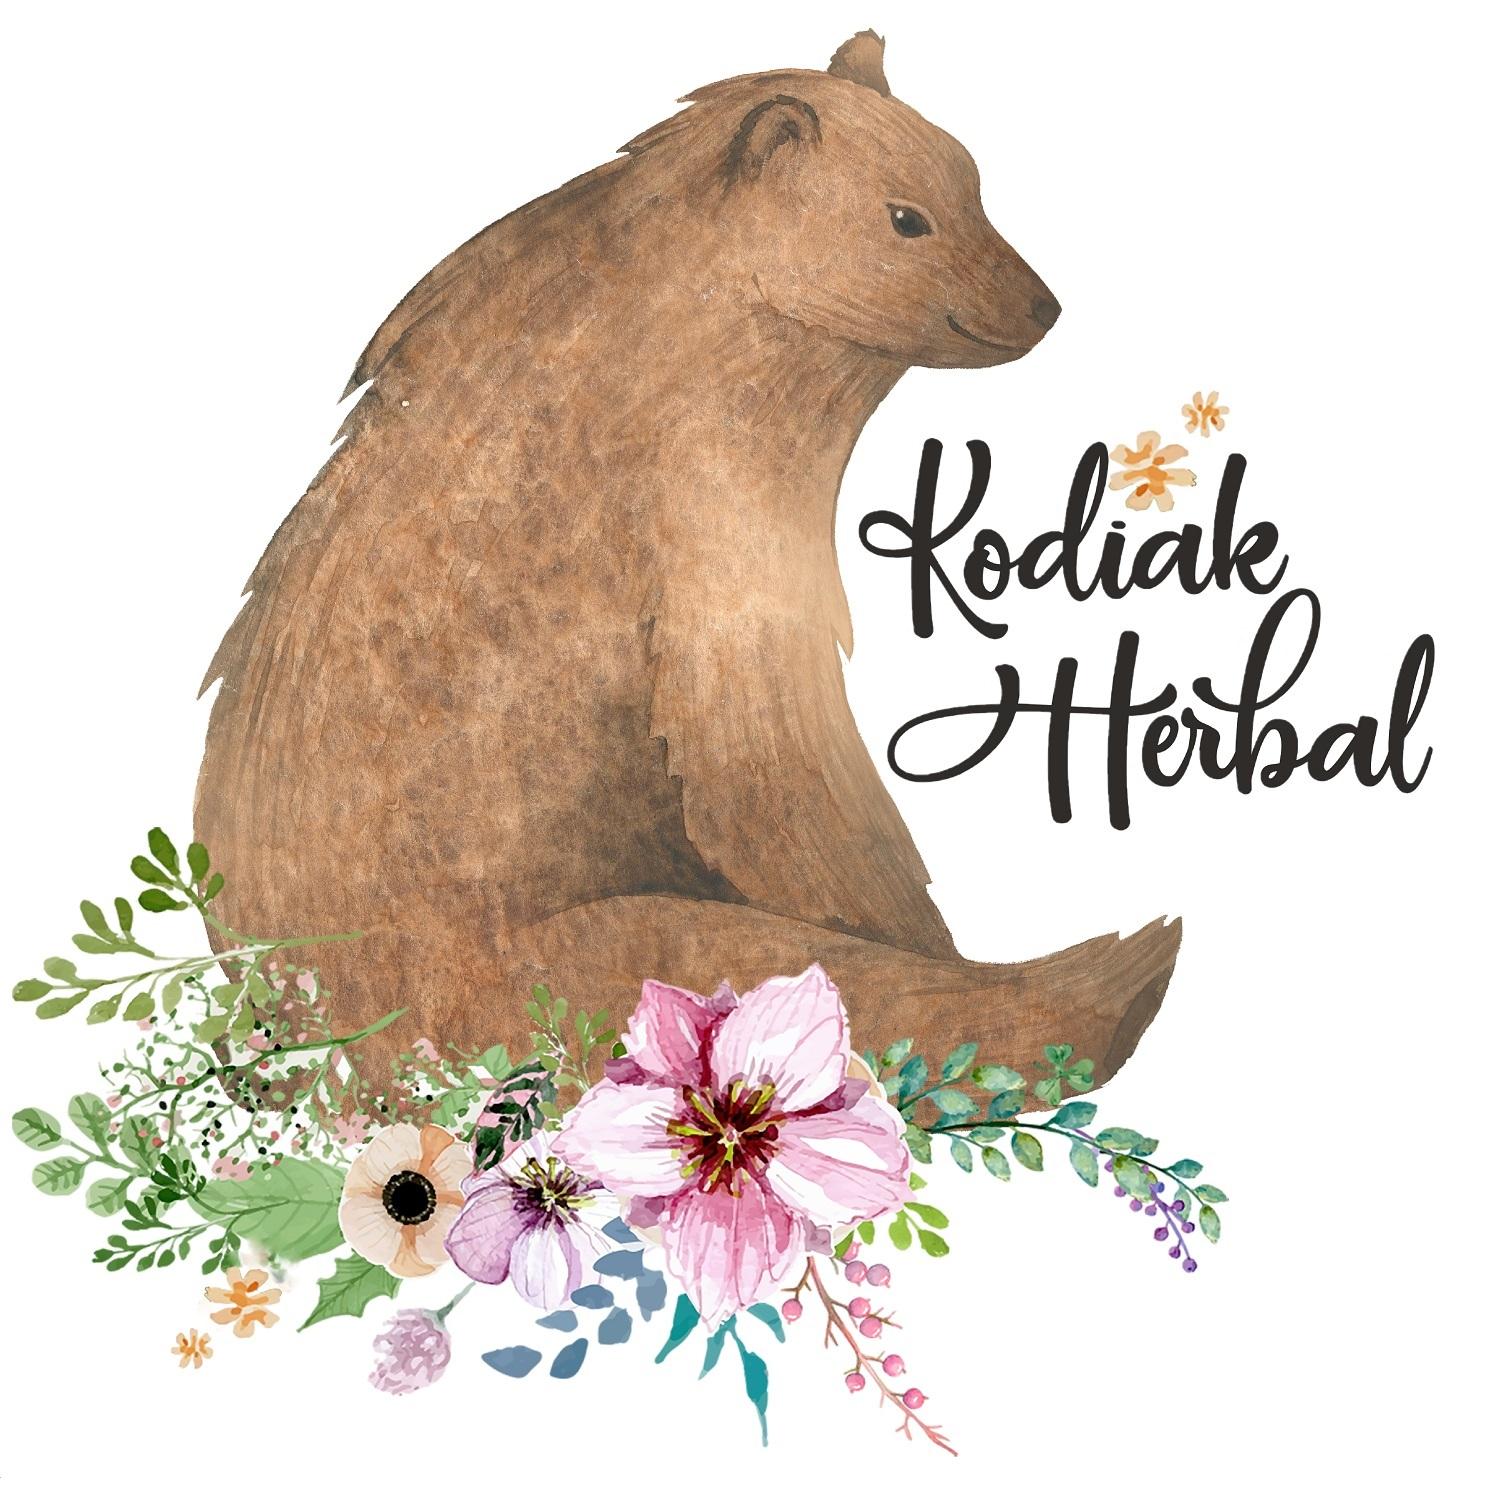 kodiak herbal logo - bear with flowers